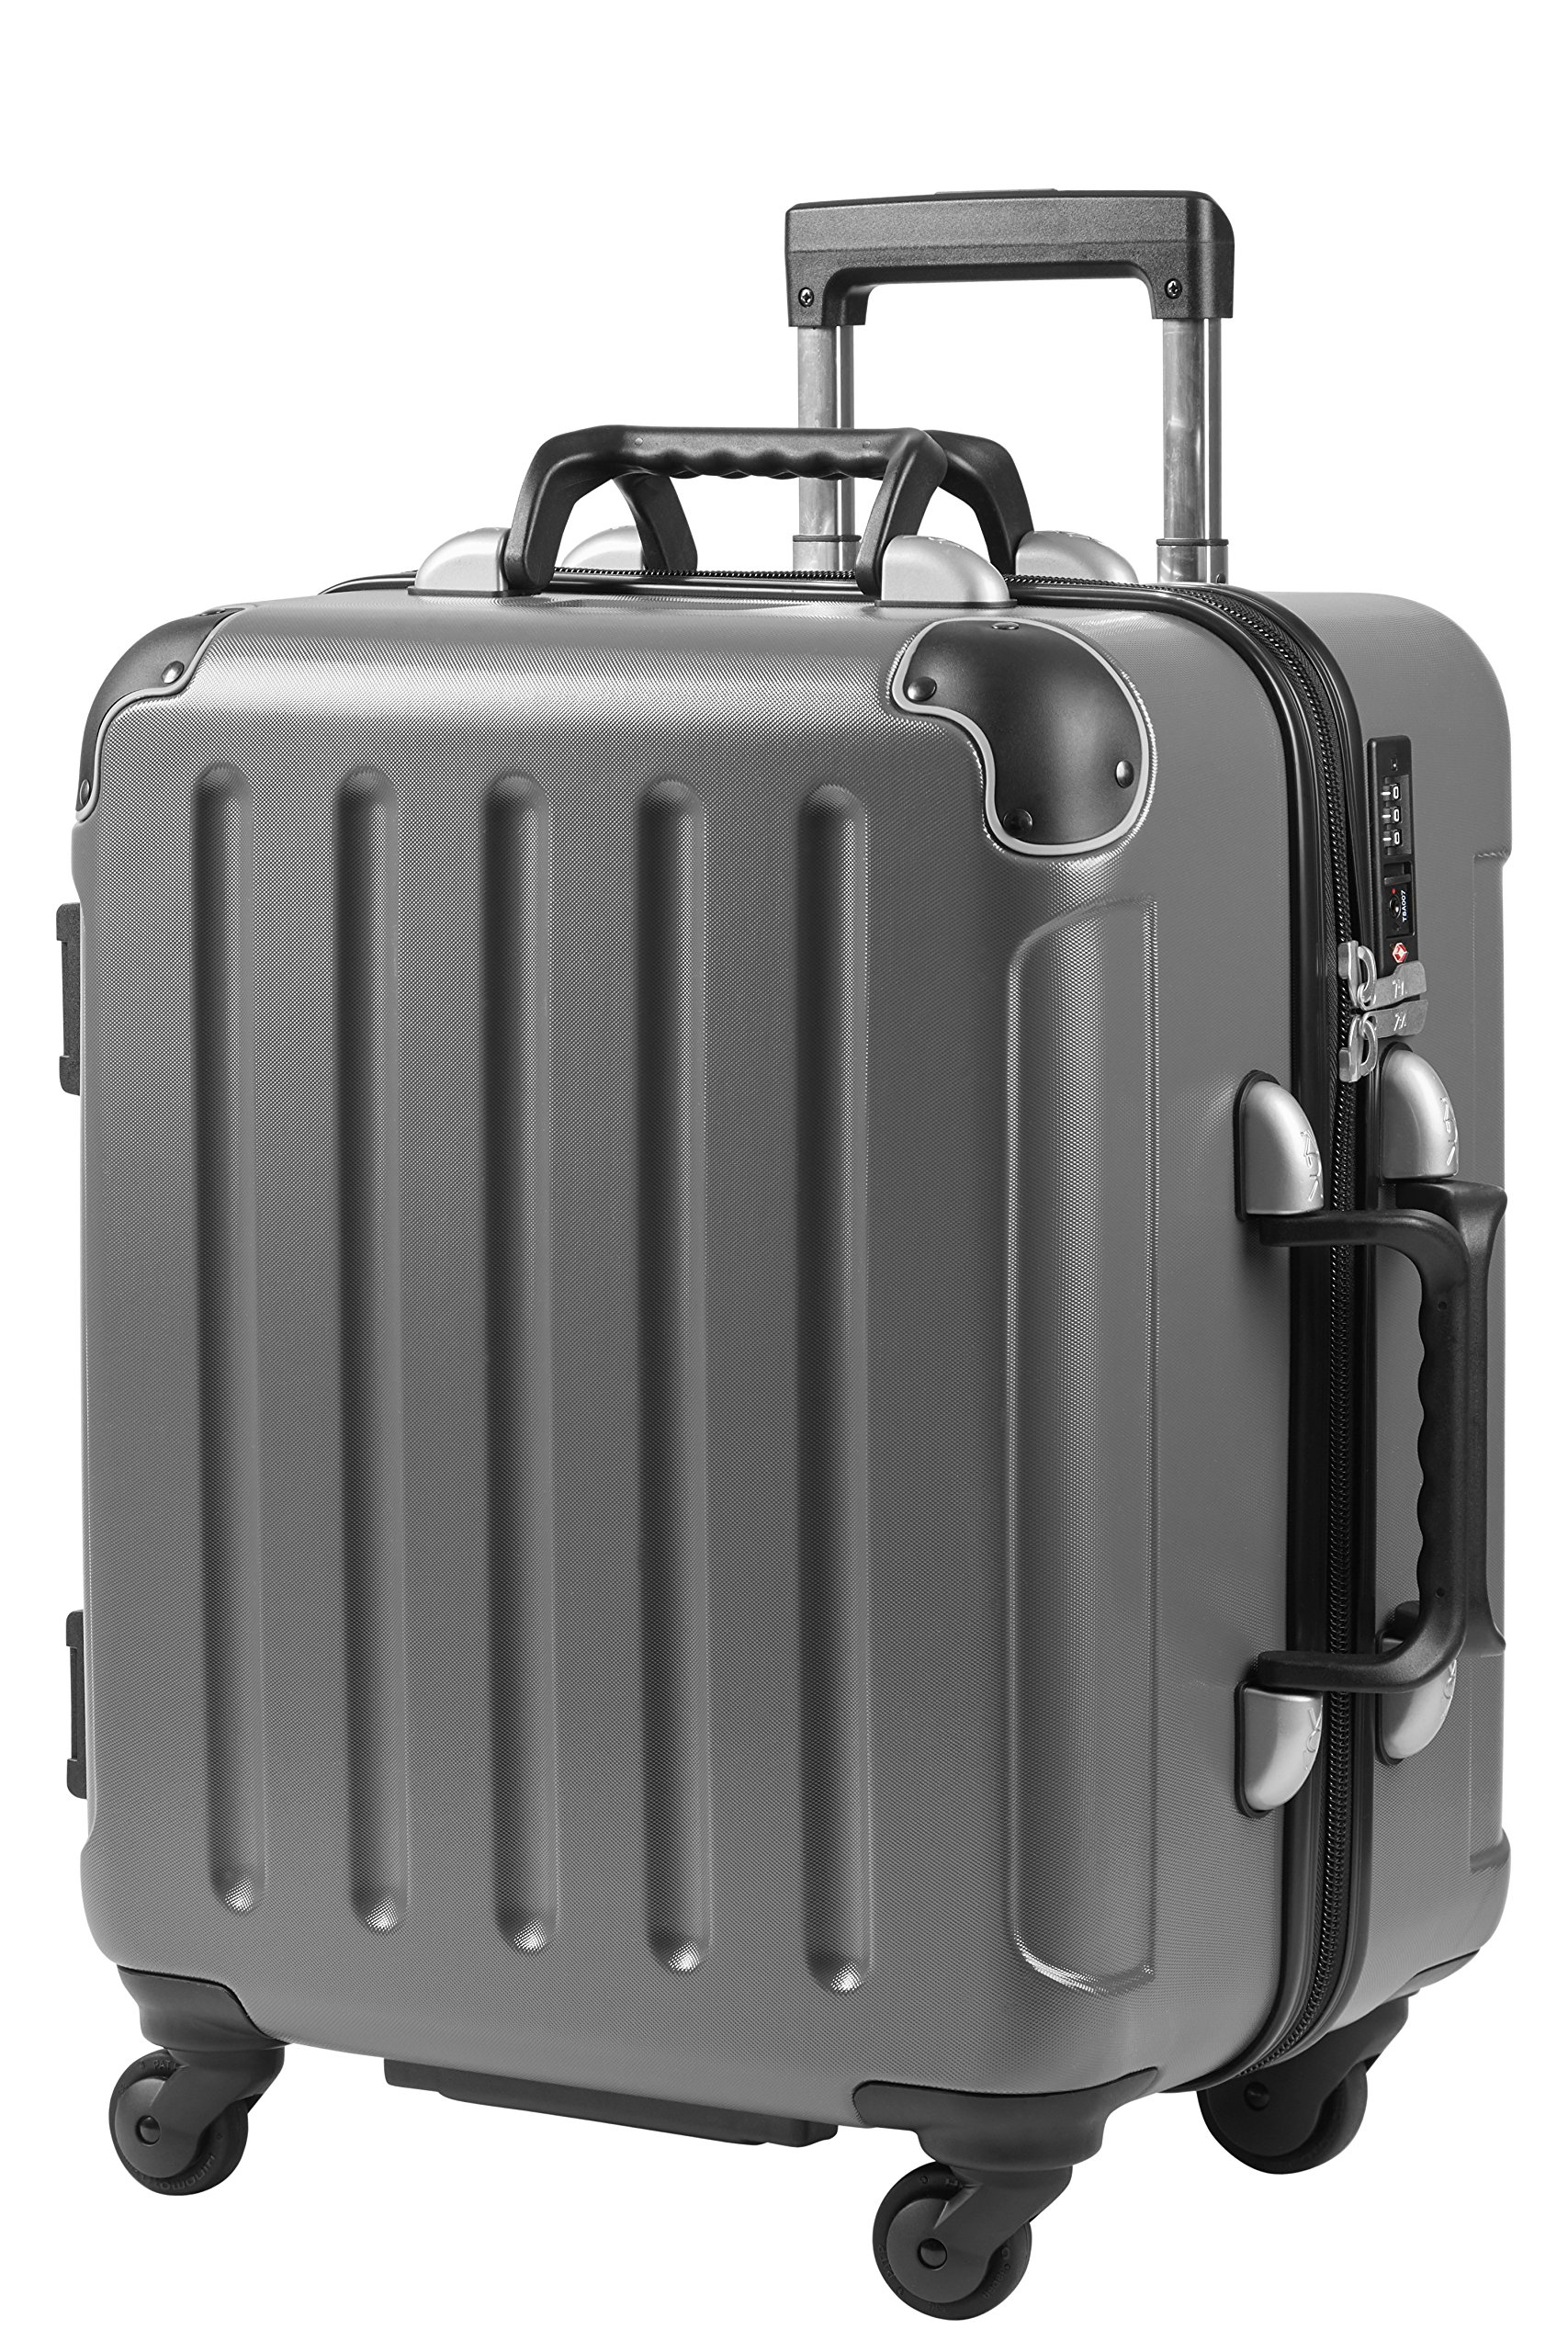 VinGardeValise Petite   Wine Travel Suitcase   All-purpose Luggage   ( Small Size 22.5'') 8 Bottles (Grey)